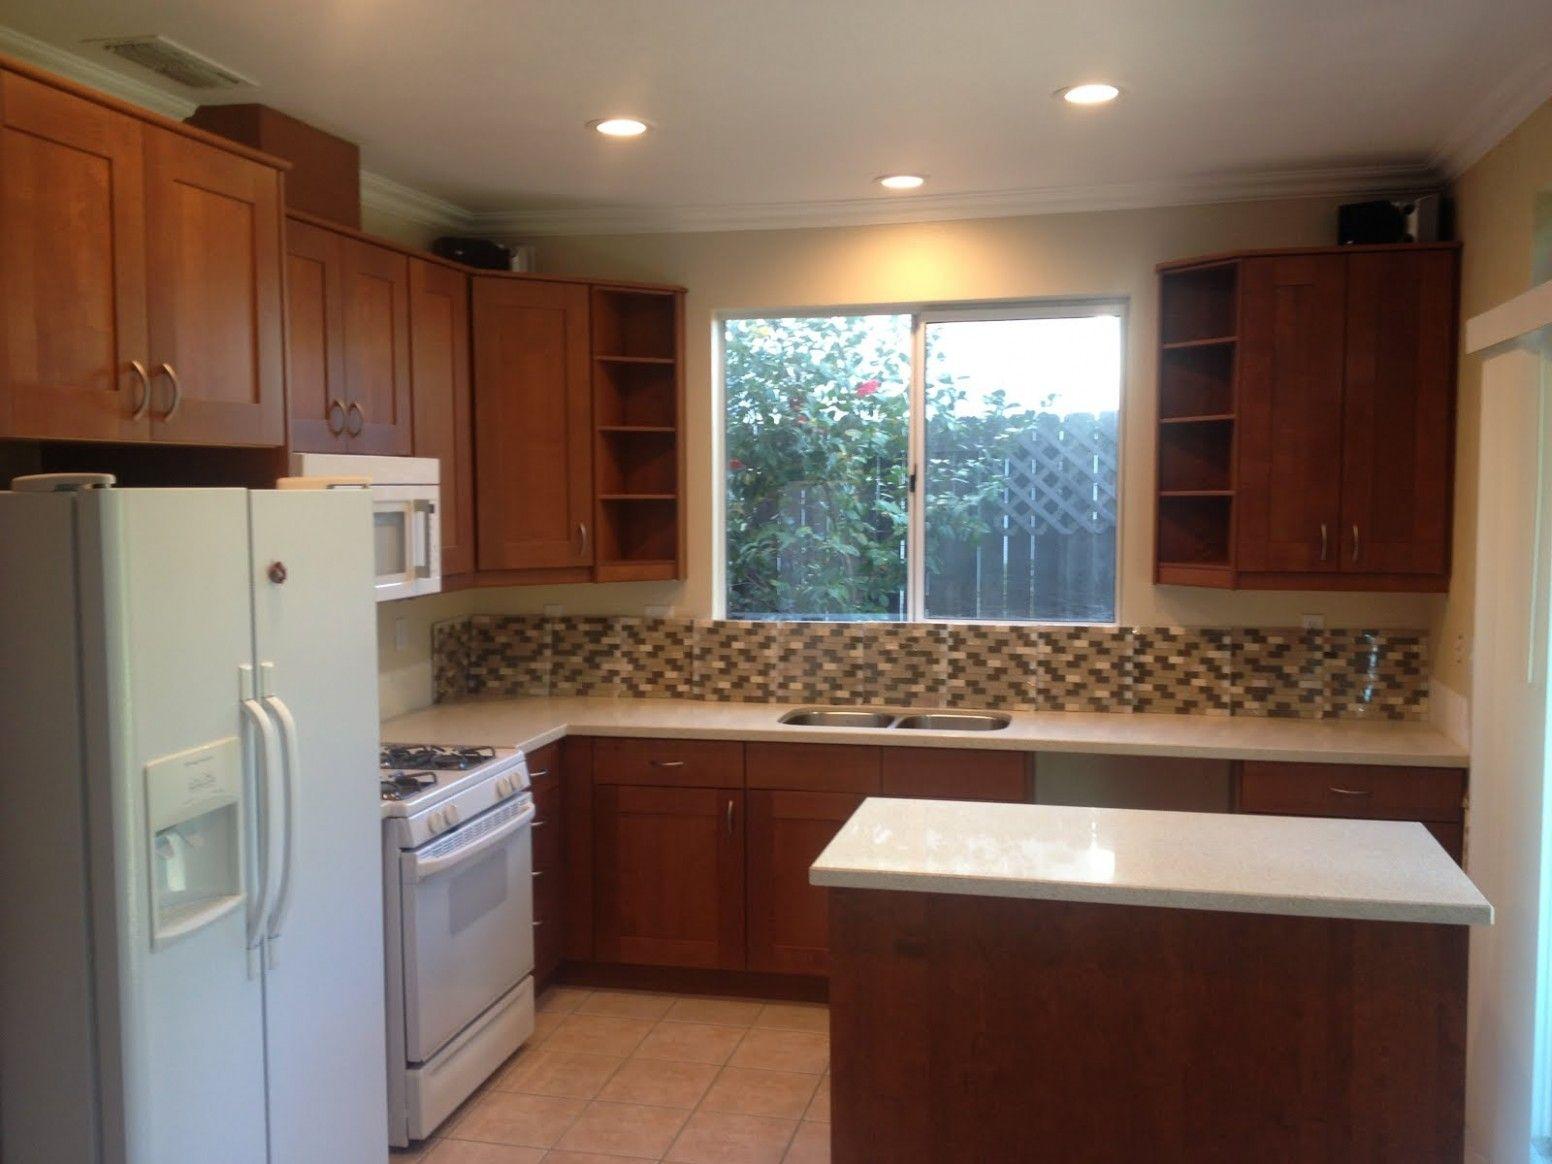 Kitchen Unit Decor End Panels in 8  Kitchen units decor